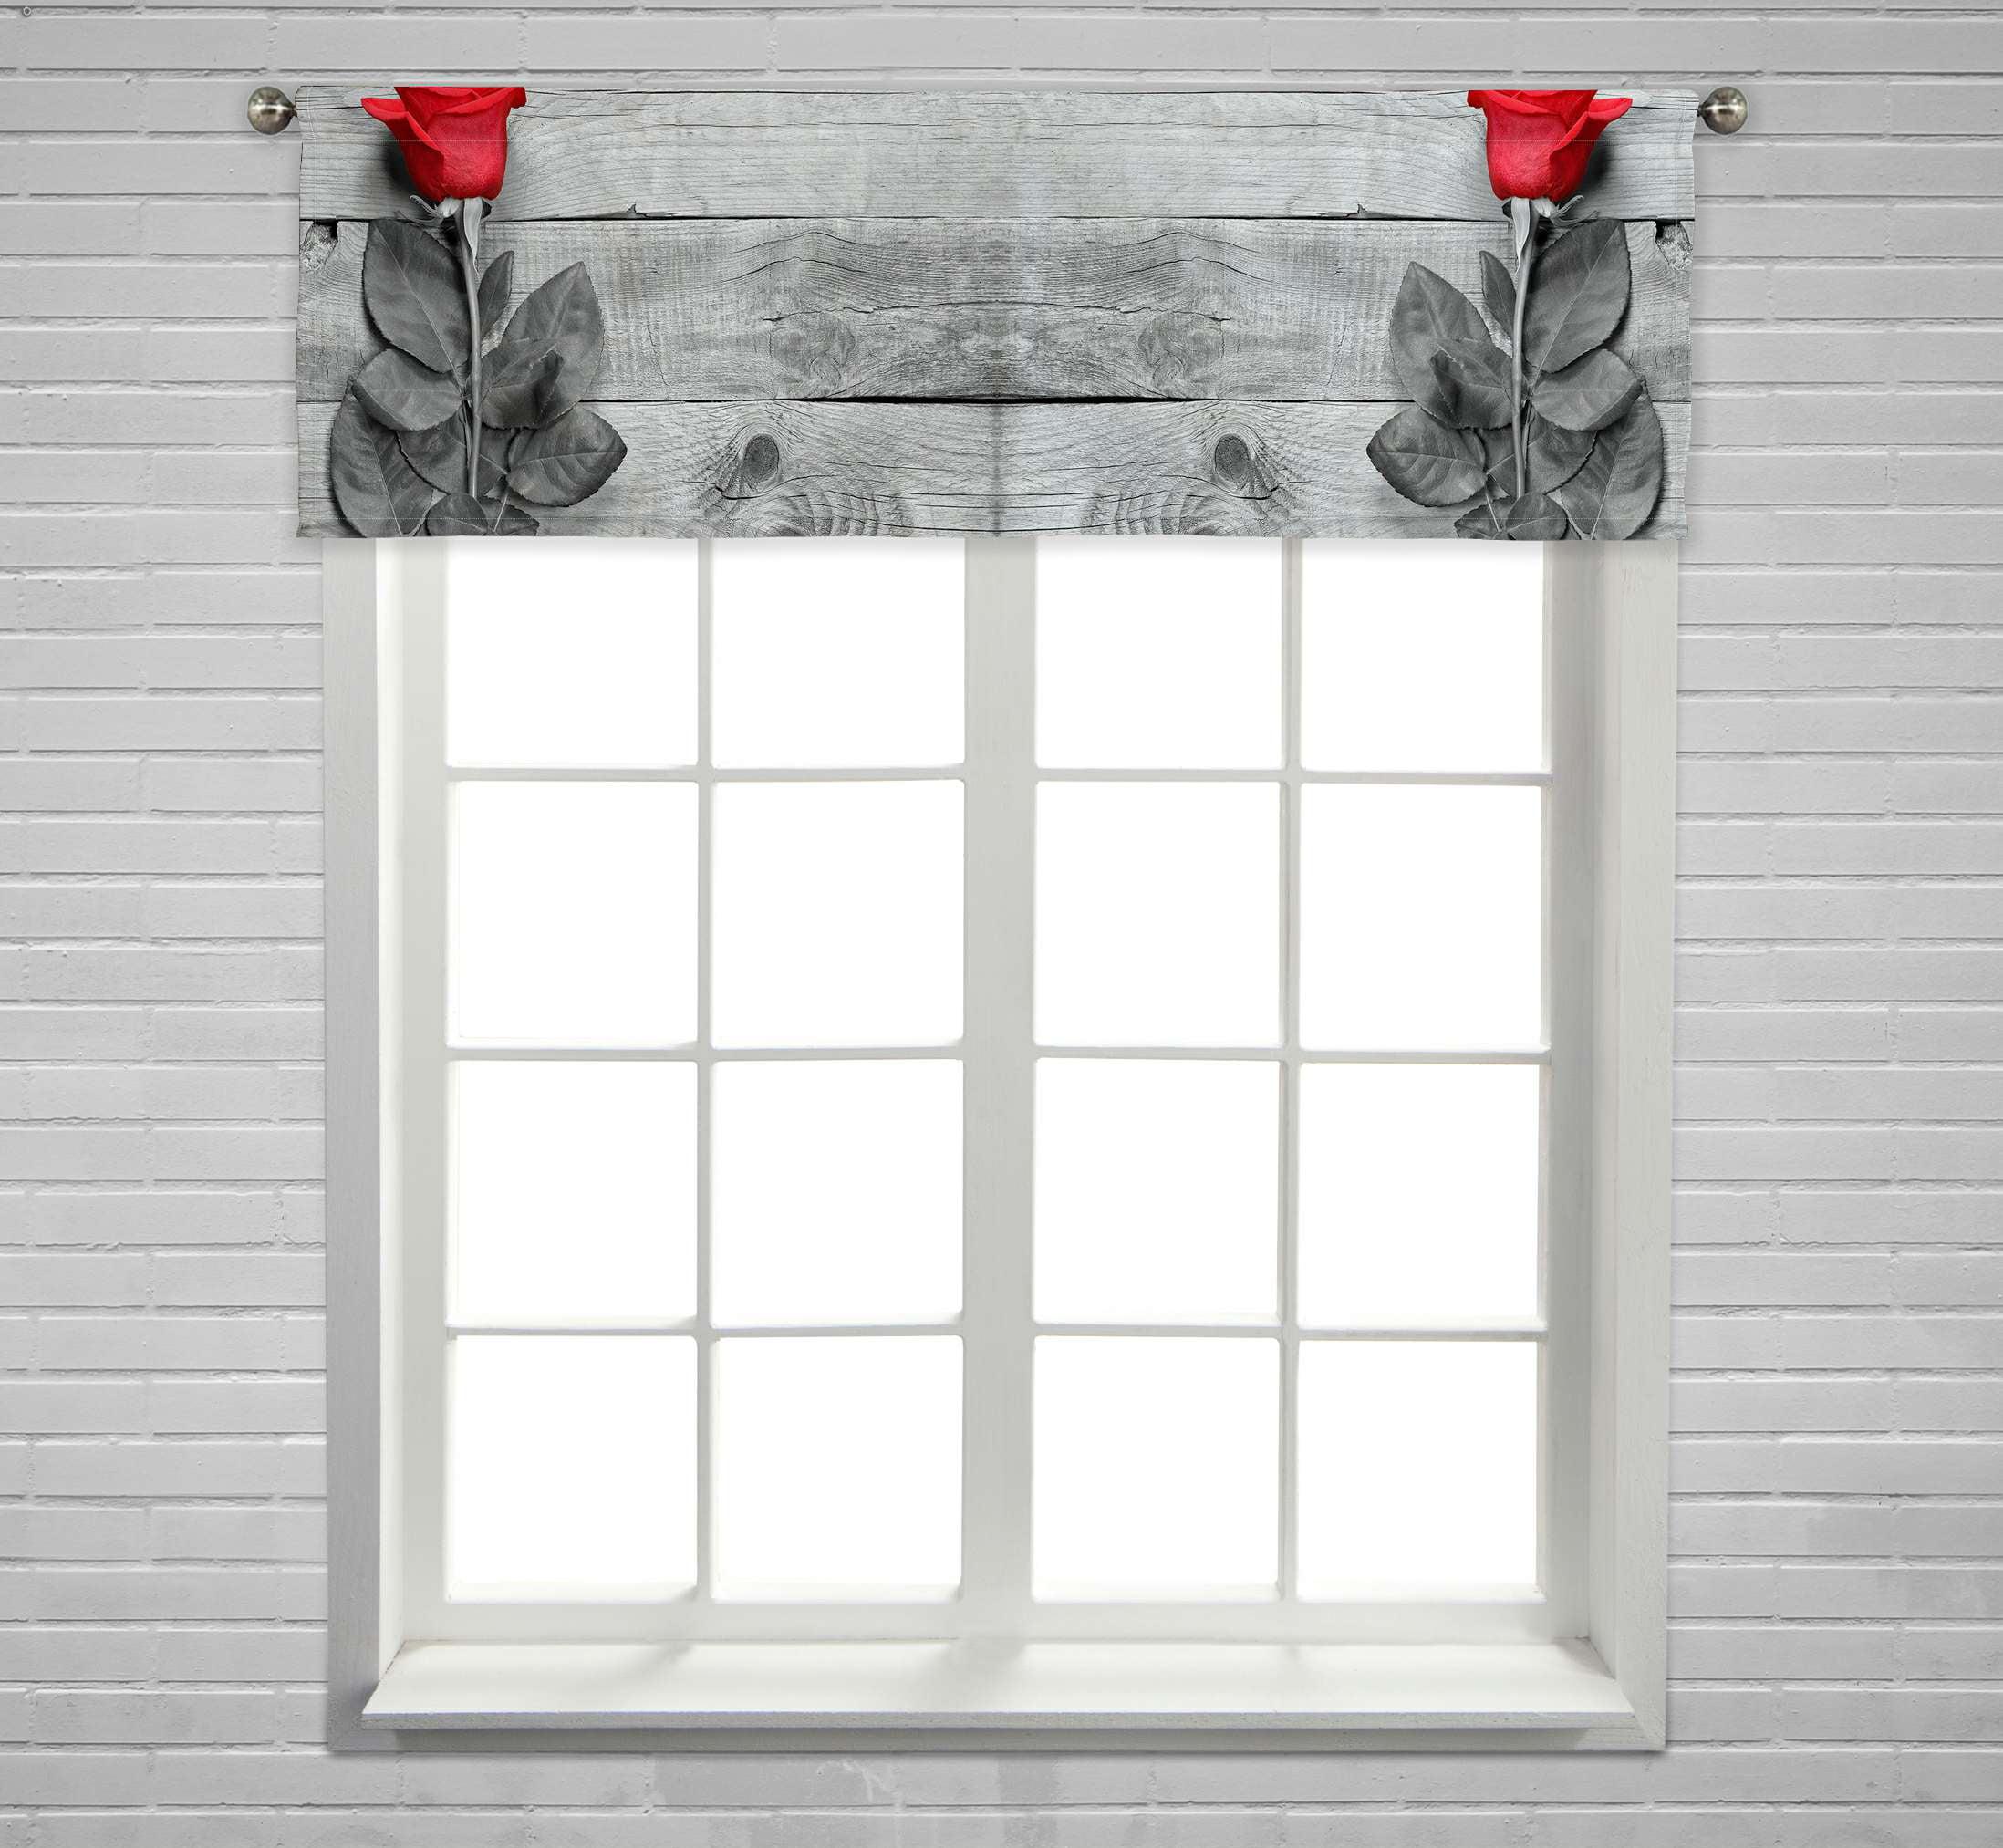 Eczjnt Red Rose Black White Wooden Window Curtain Valance Rod Pocket Size 54x18 Inch Walmart Com Walmart Com